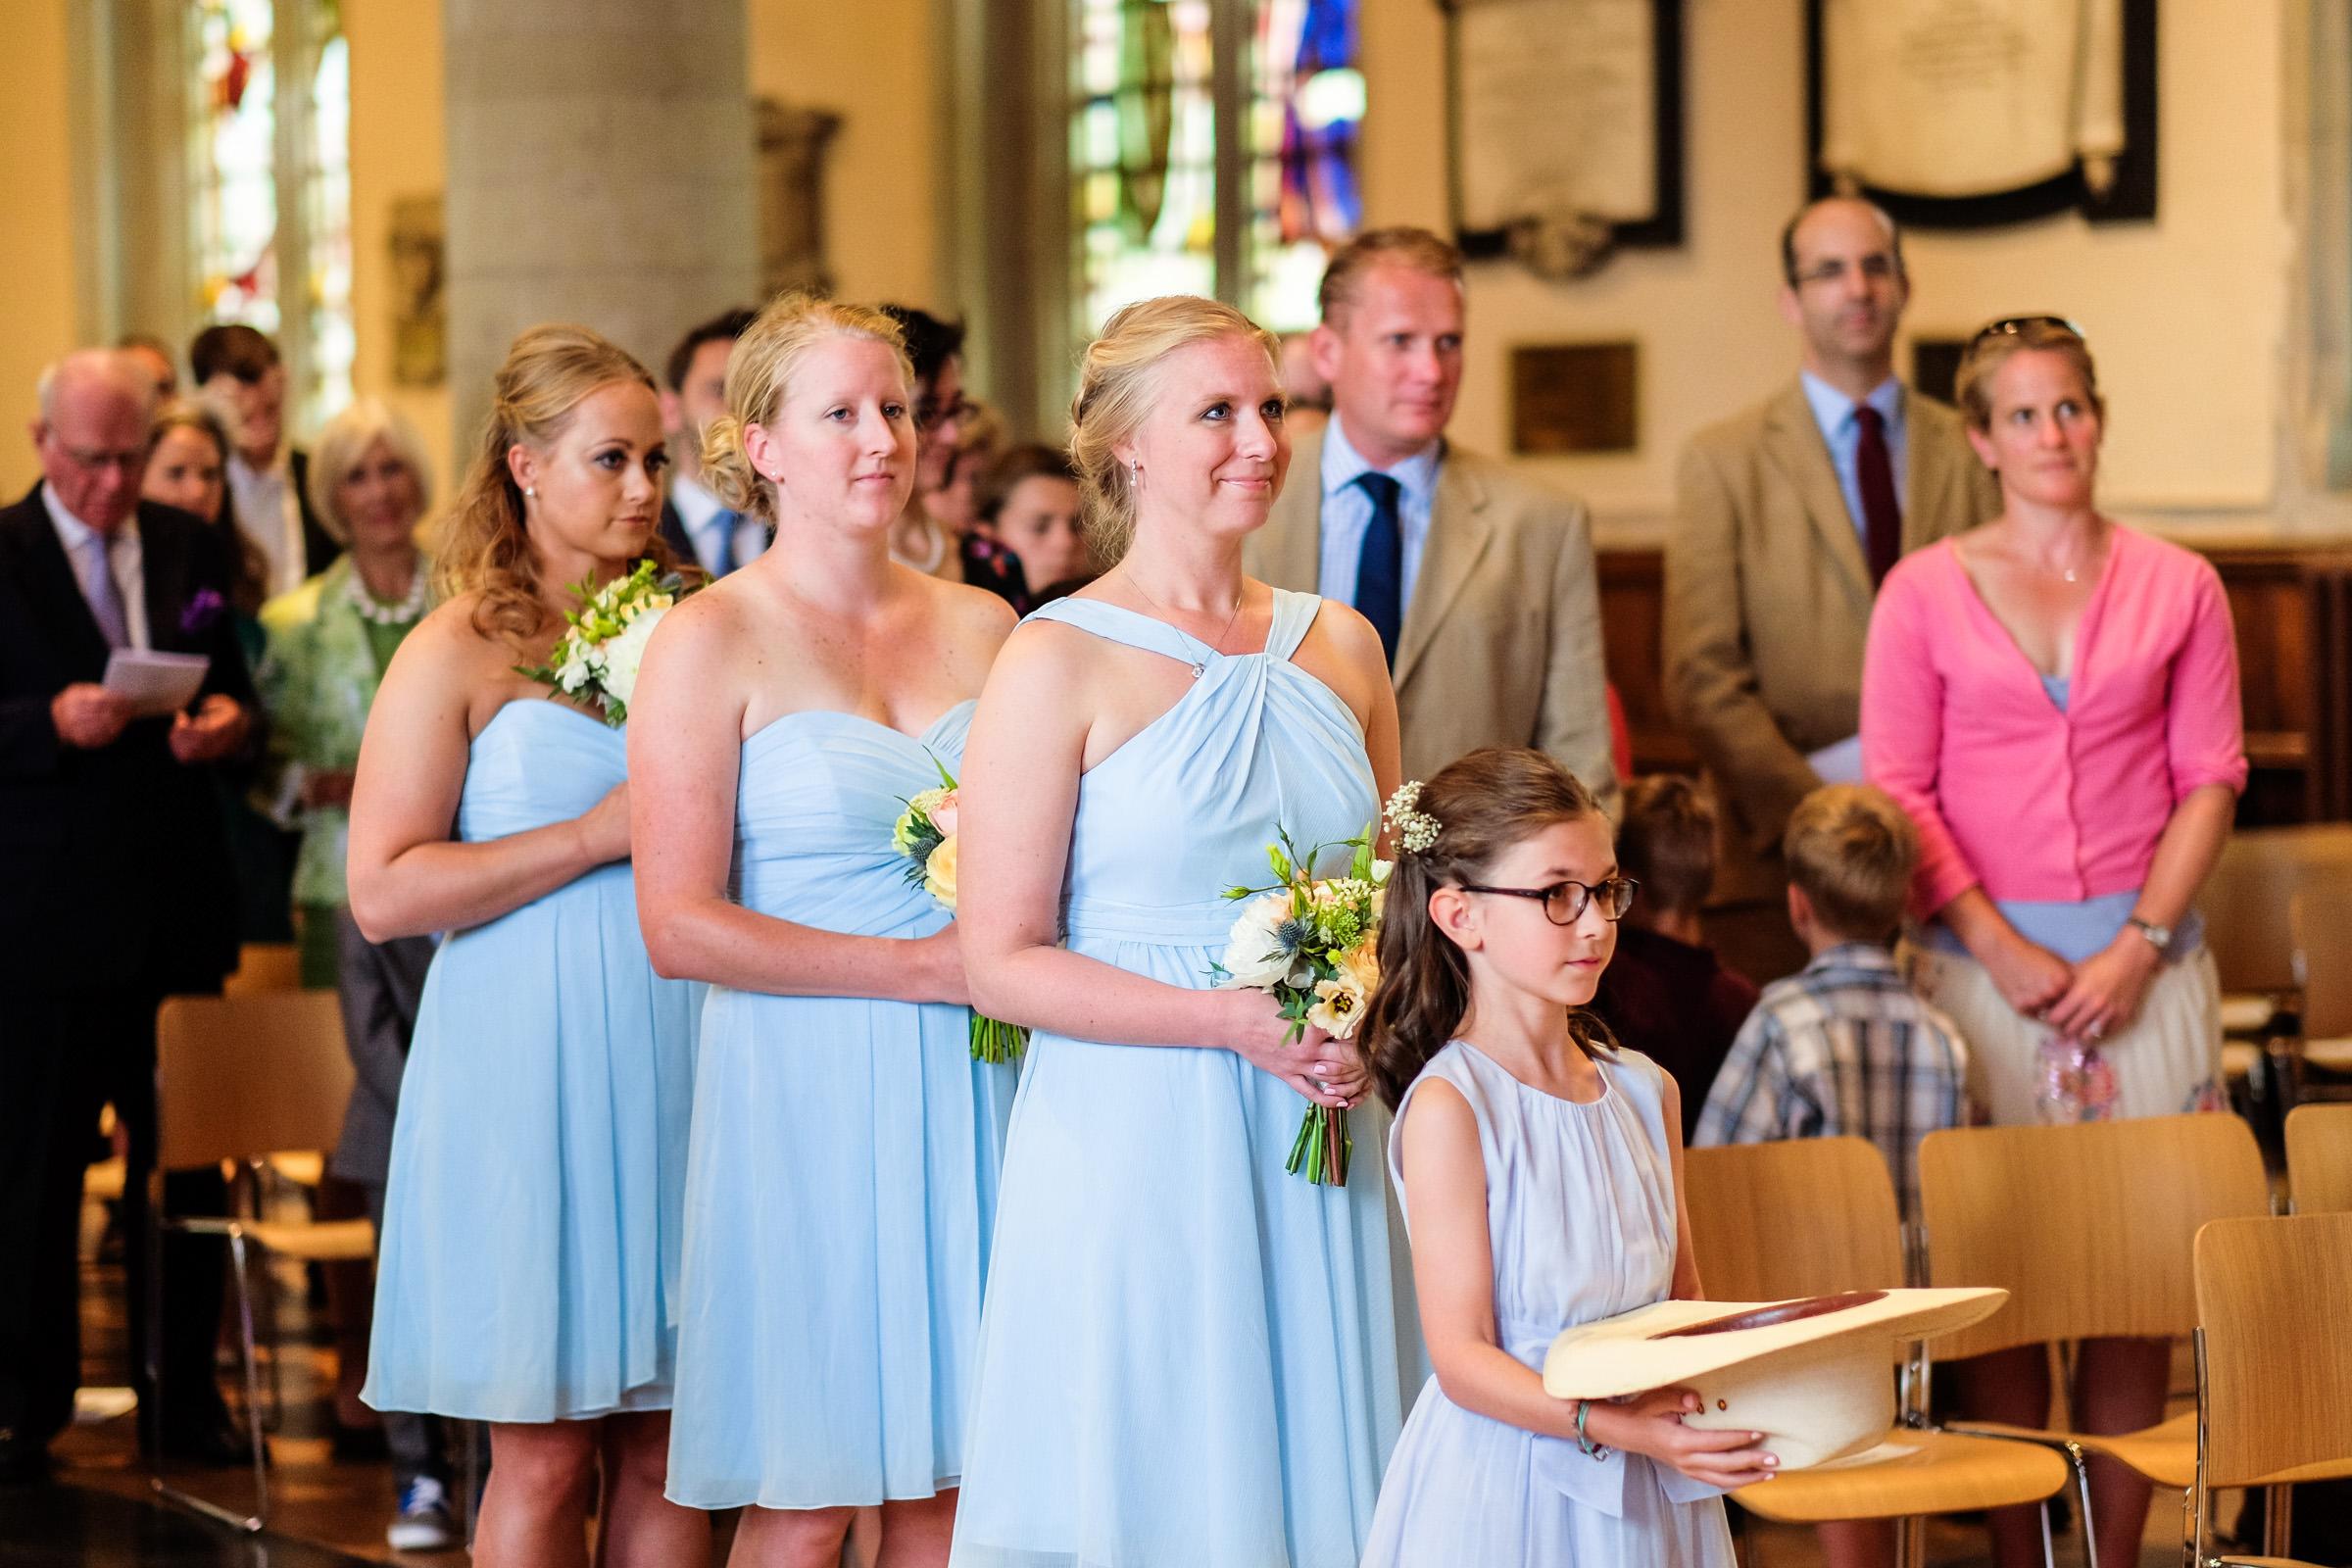 Wedding at St. Mary's Church in Surrey 011.jpg